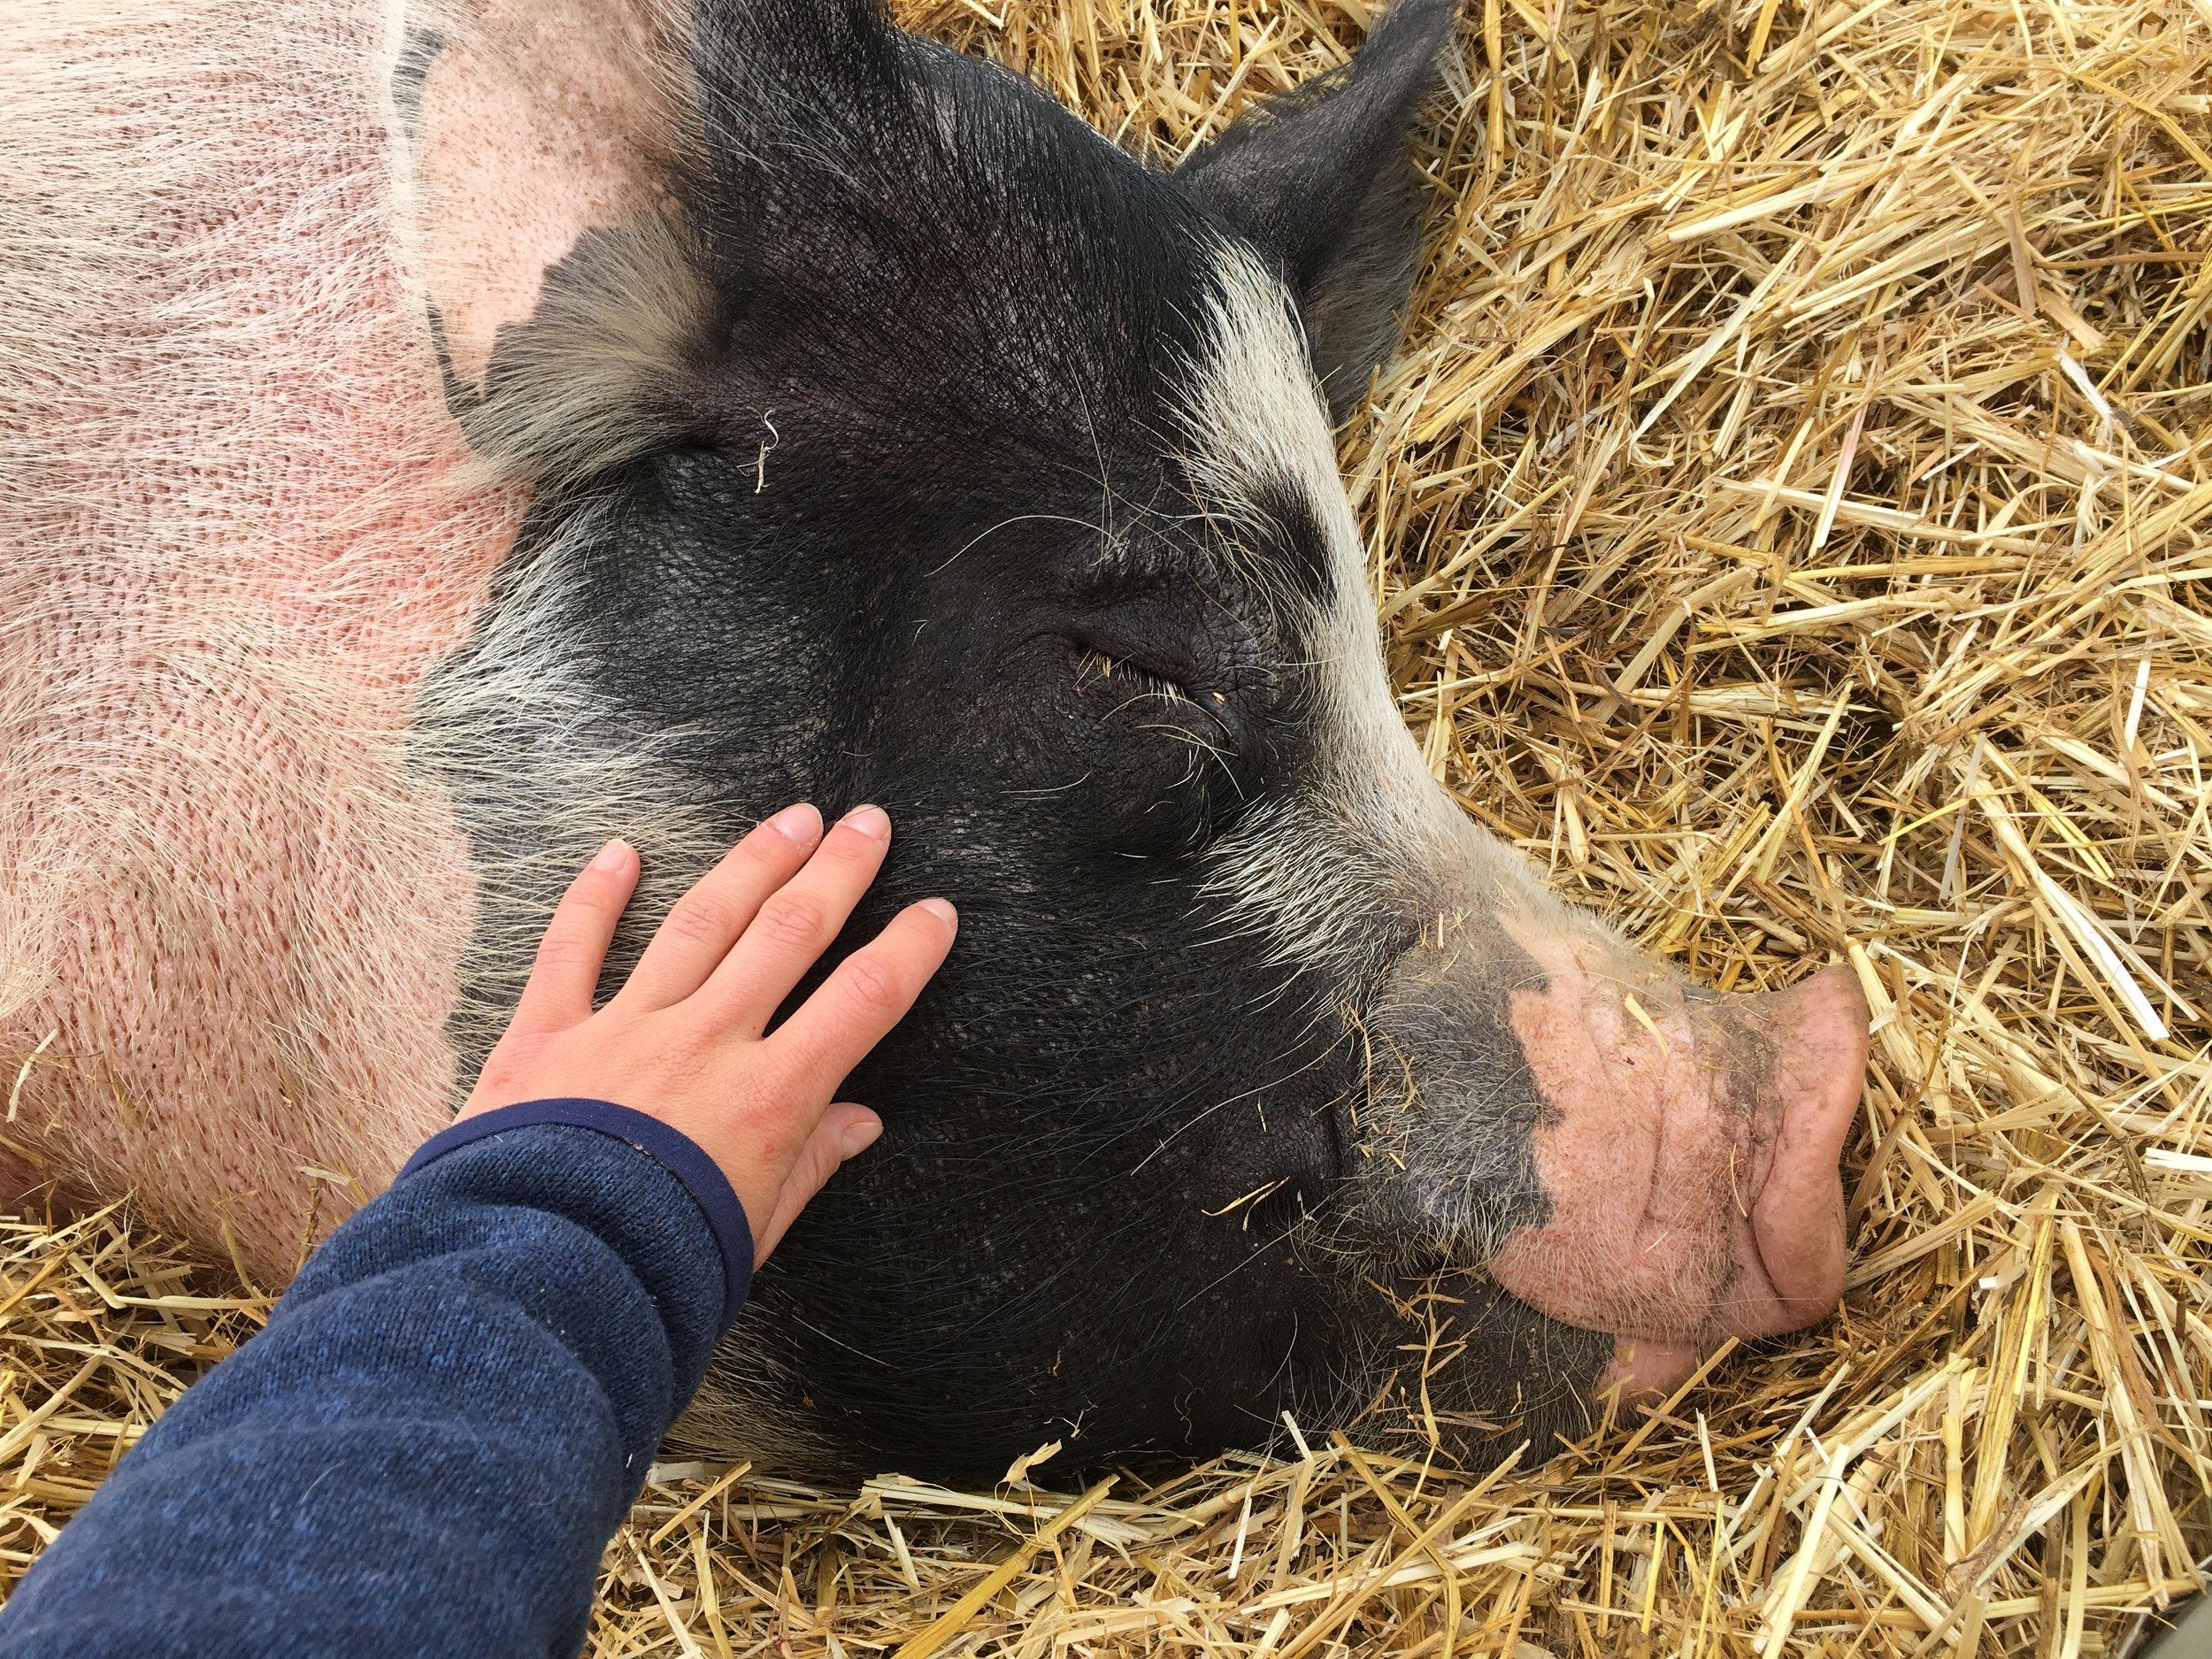 Loving Farm Animal Sanctuary - Media Management and Strategy